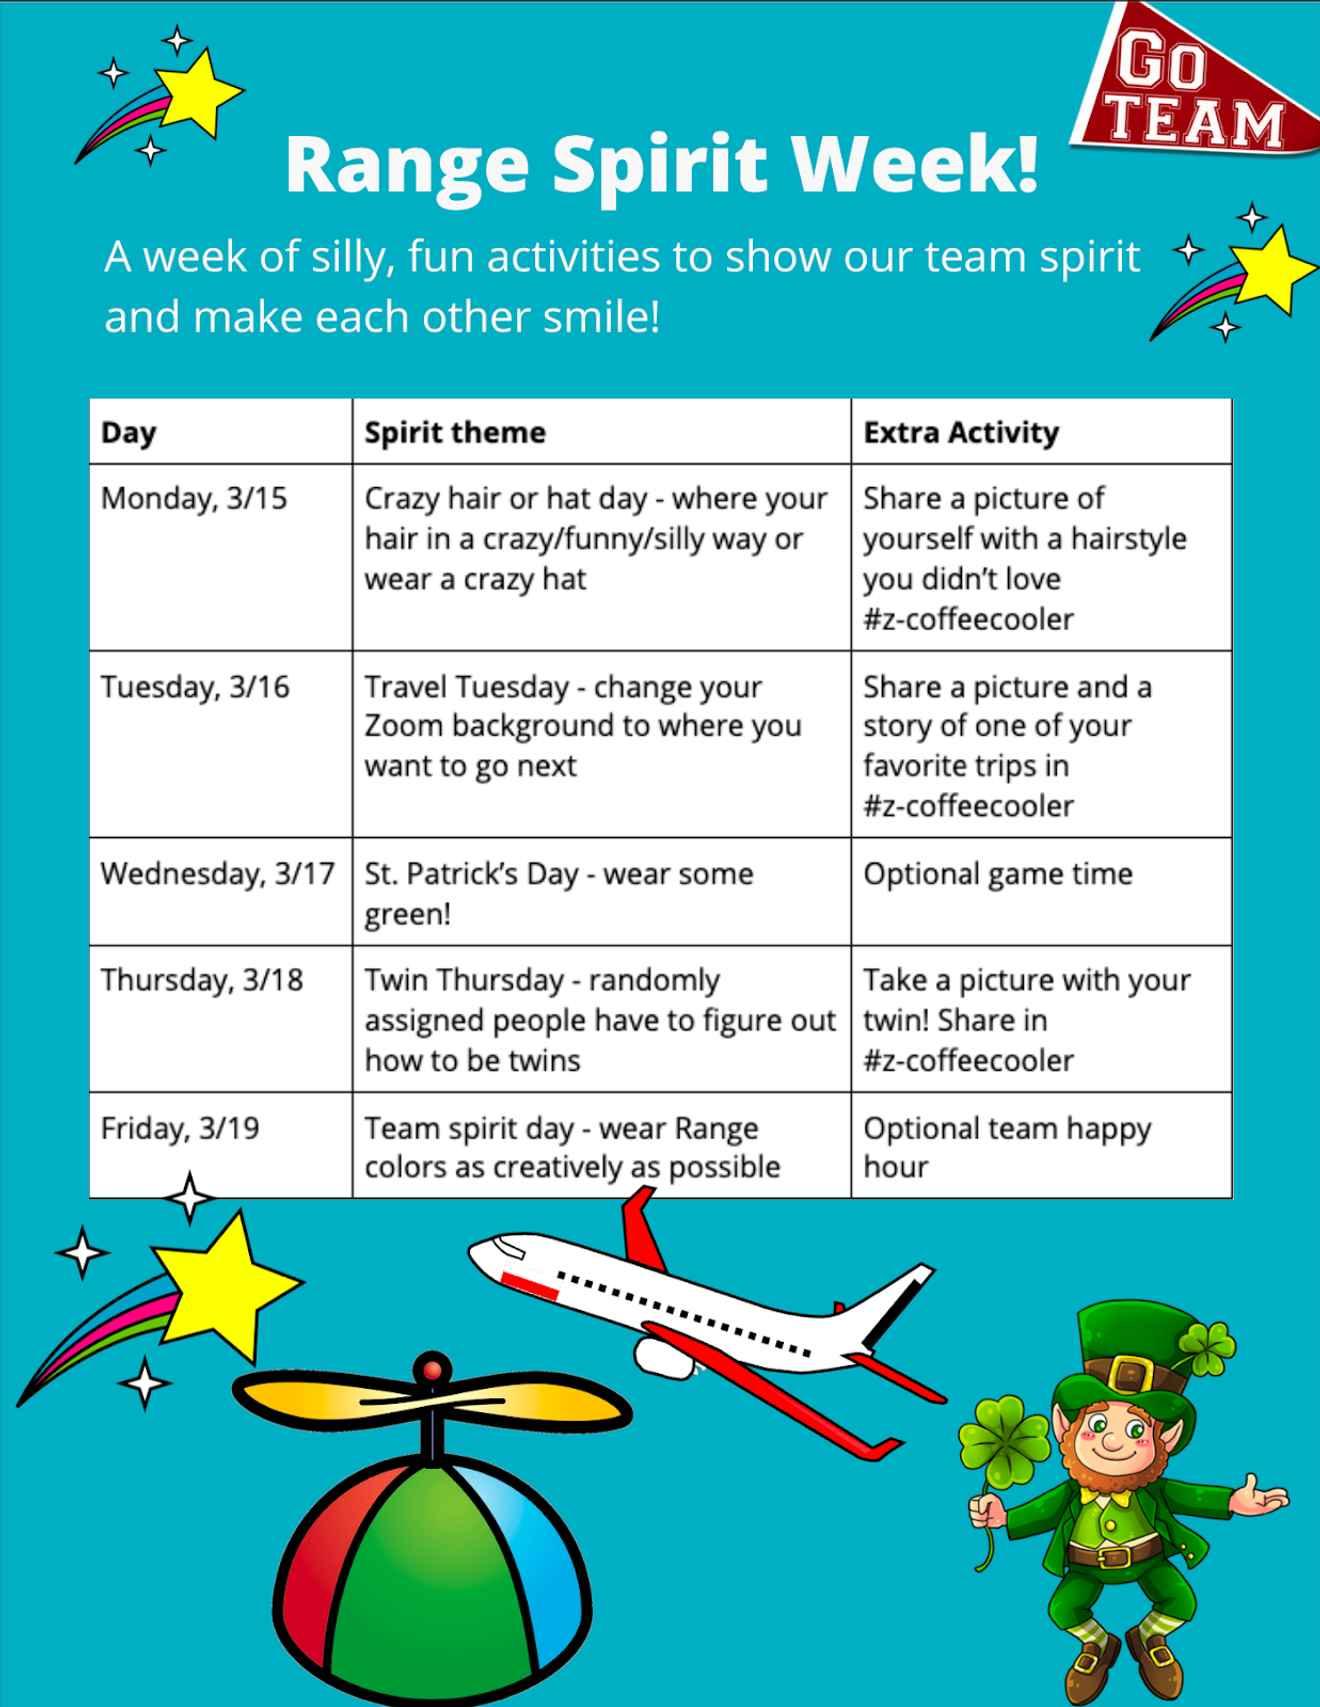 Spirit Week flier with schedule of events